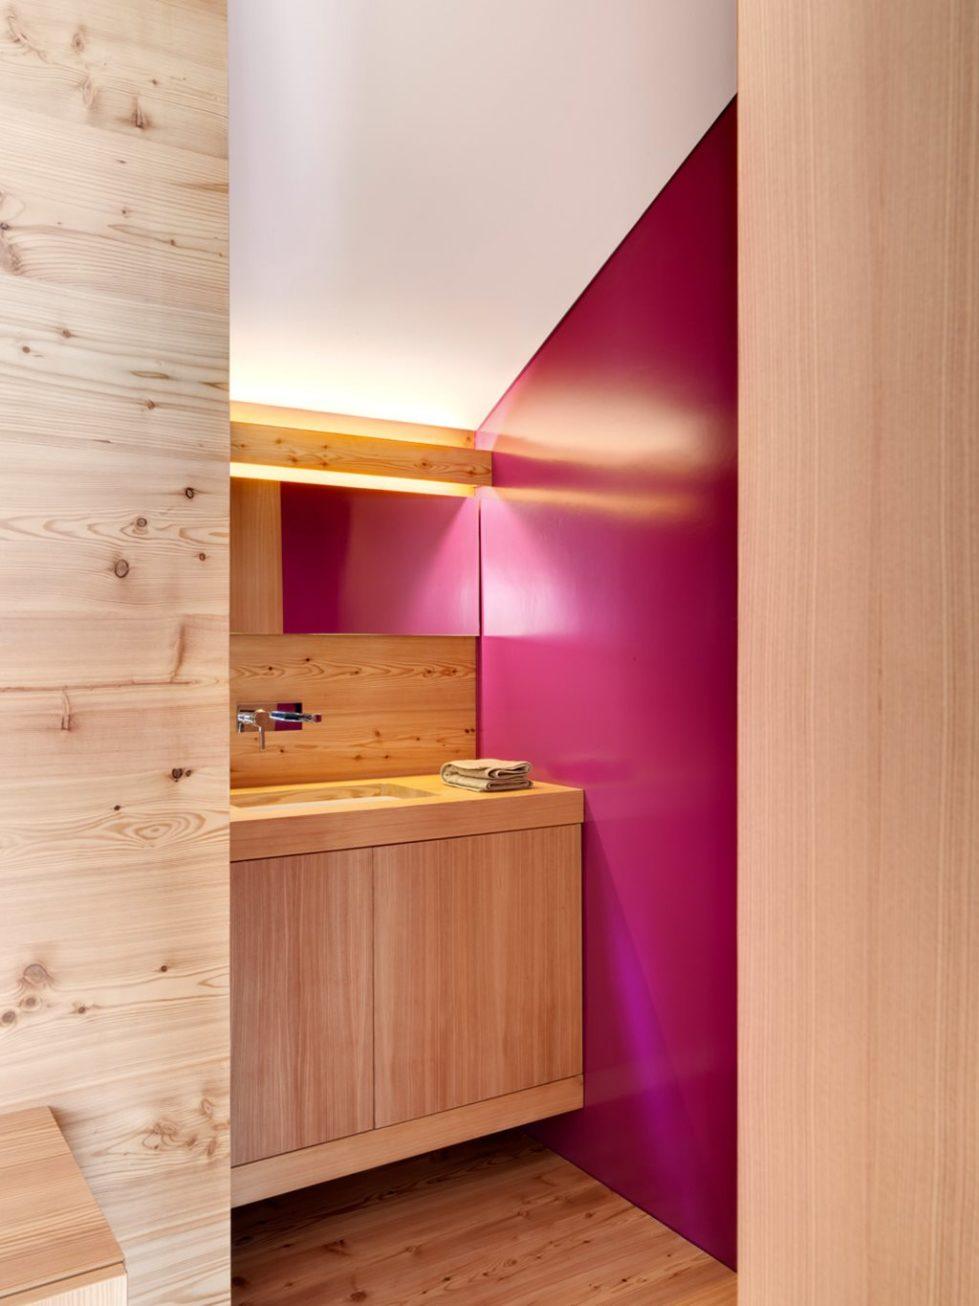 Humble Chalet in Switzerland - Bathroom